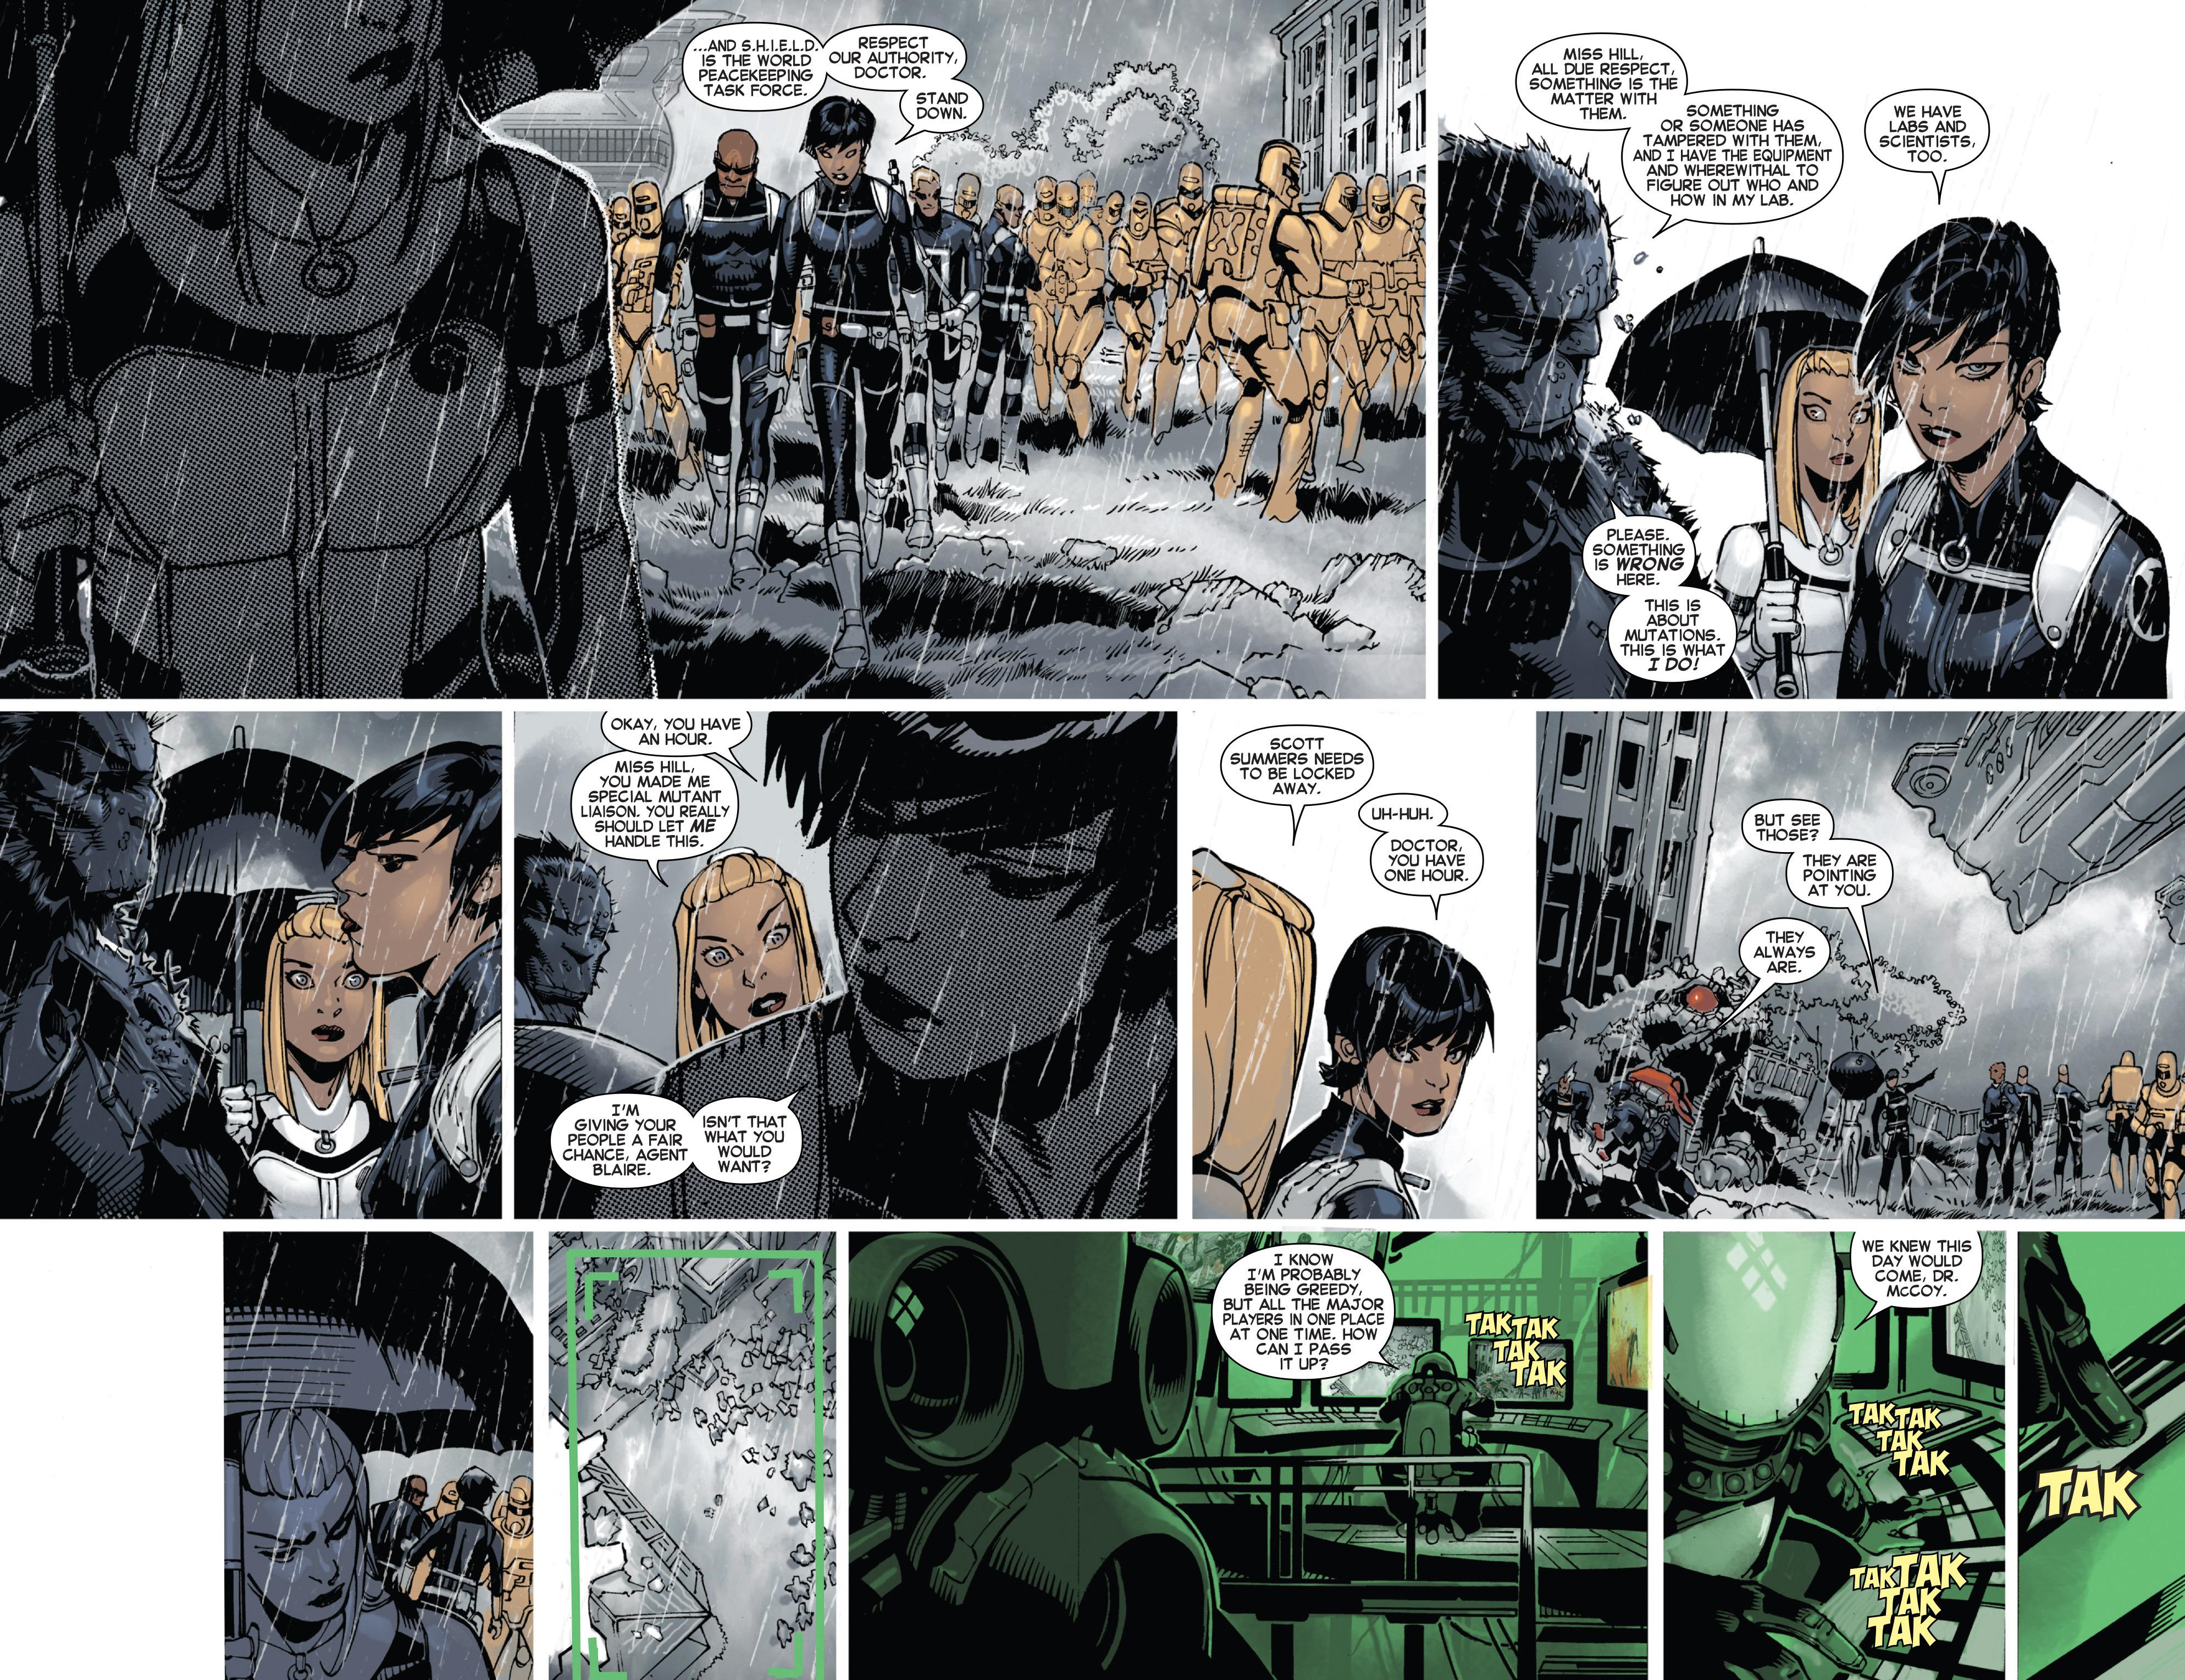 Read online Uncanny X-Men (2013) comic -  Issue # _TPB 4 - vs. S.H.I.E.L.D - 54